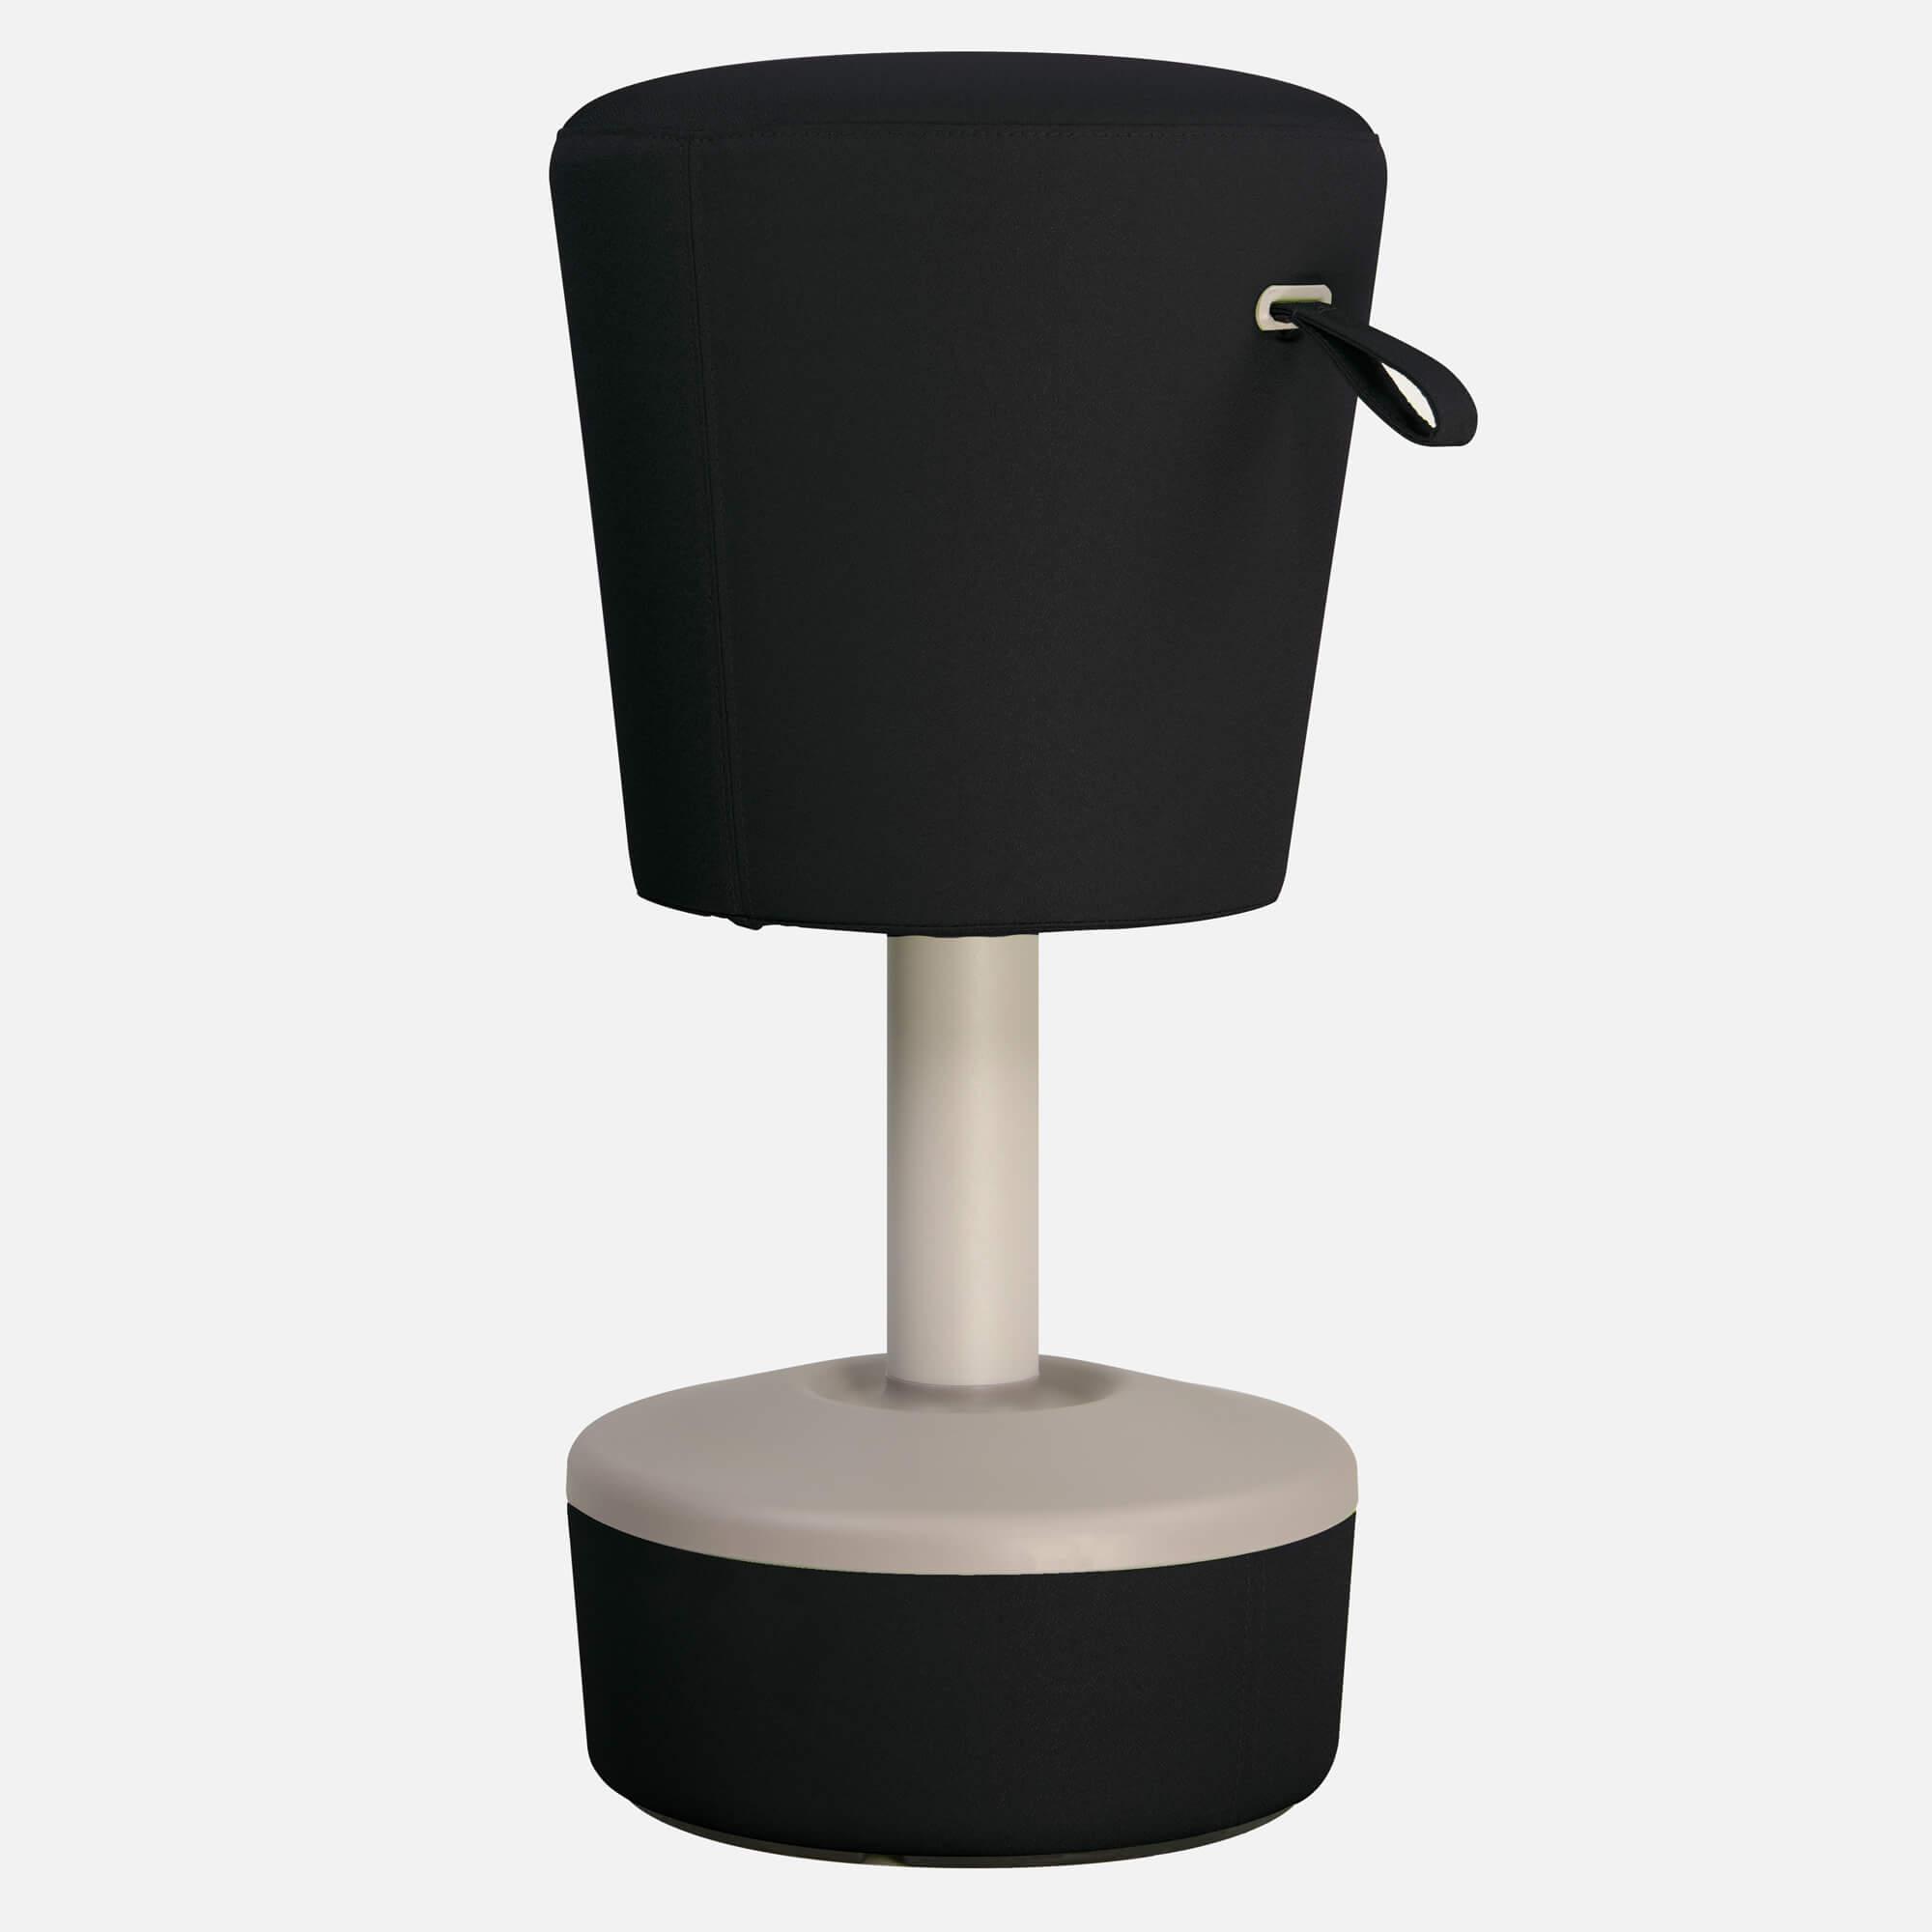 profim Sitzhocker Mickey Büro Sitz-Stand-Hocker Mickey Ø 360 mm Bürohocker Bürostuhl Sitzhöhe: 570-900 mm